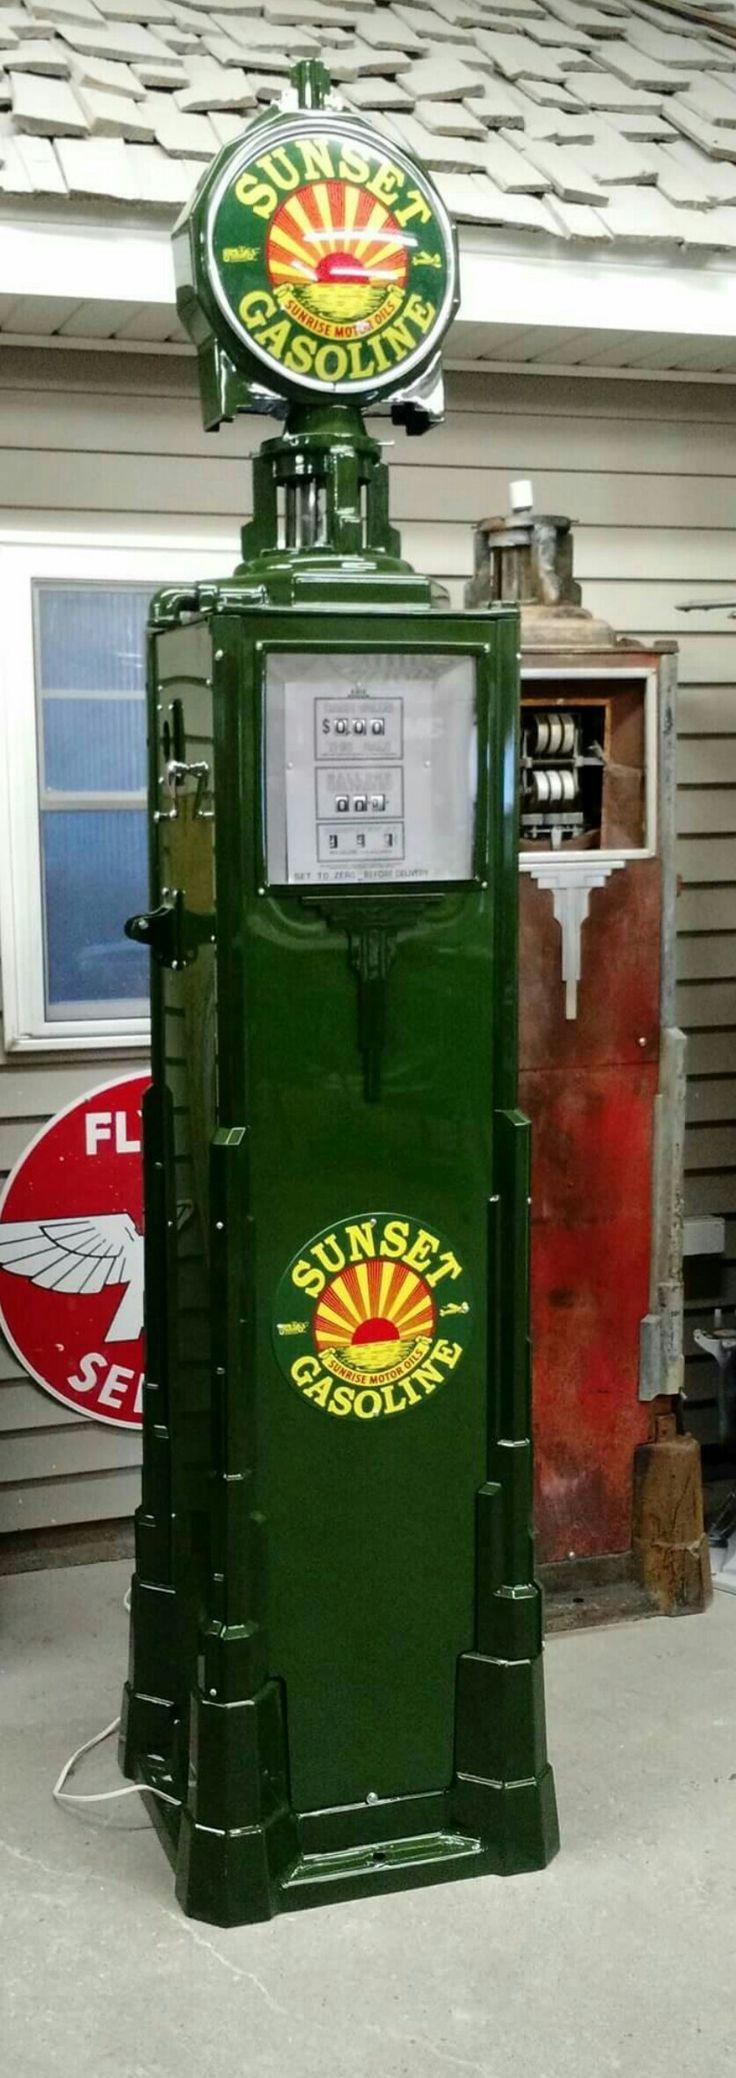 Restored Original Sunset Gas Pump - RARE